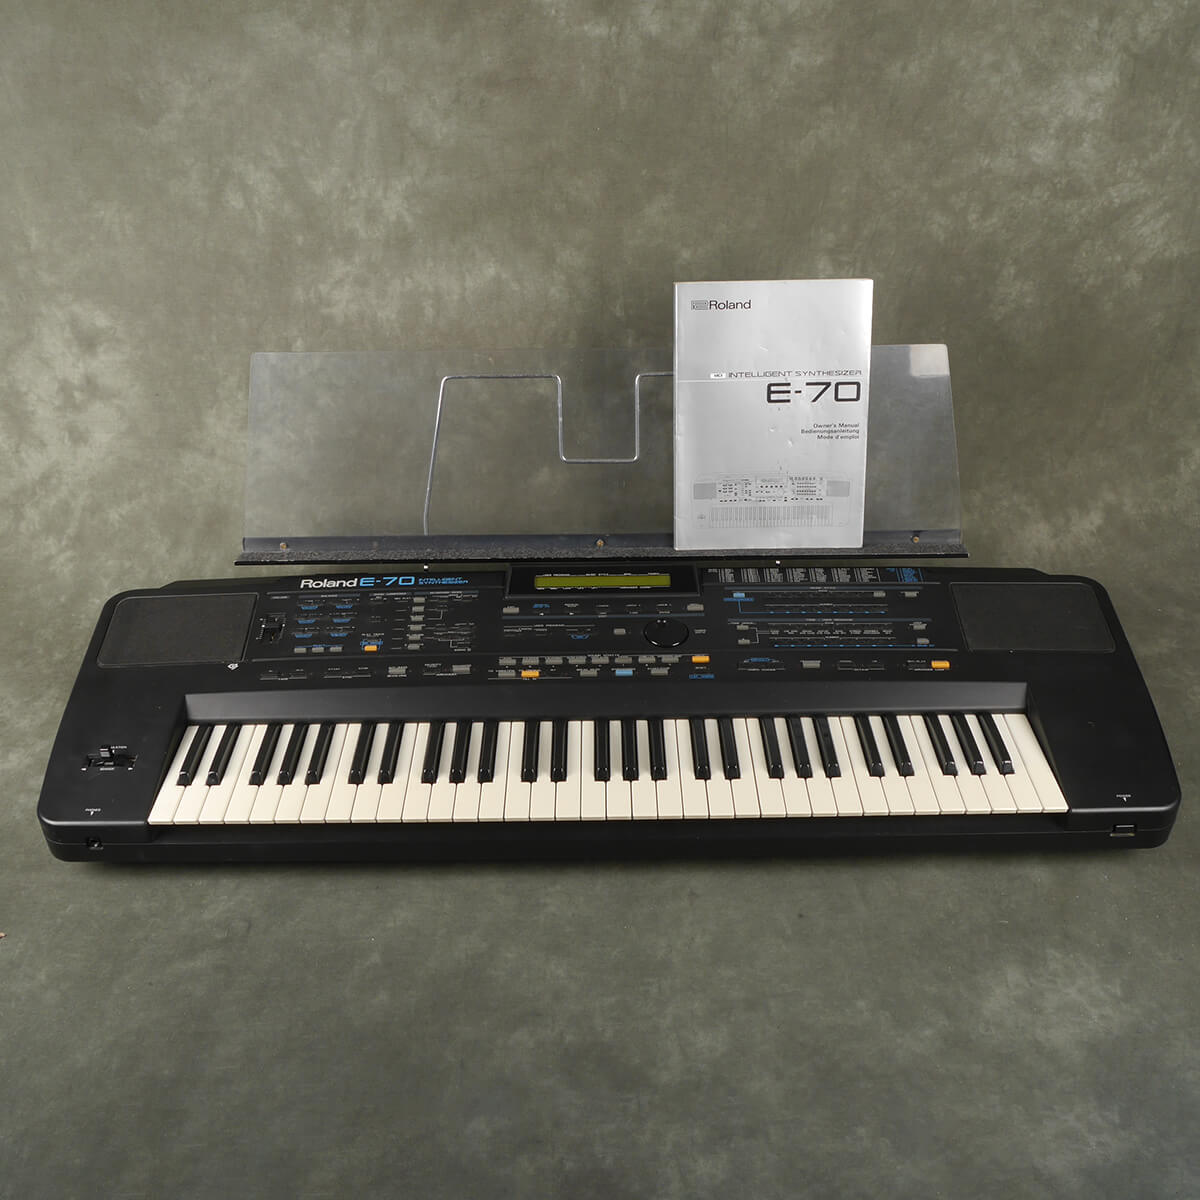 Roland E-70 Synthesizer Keyboard - 2nd Hand